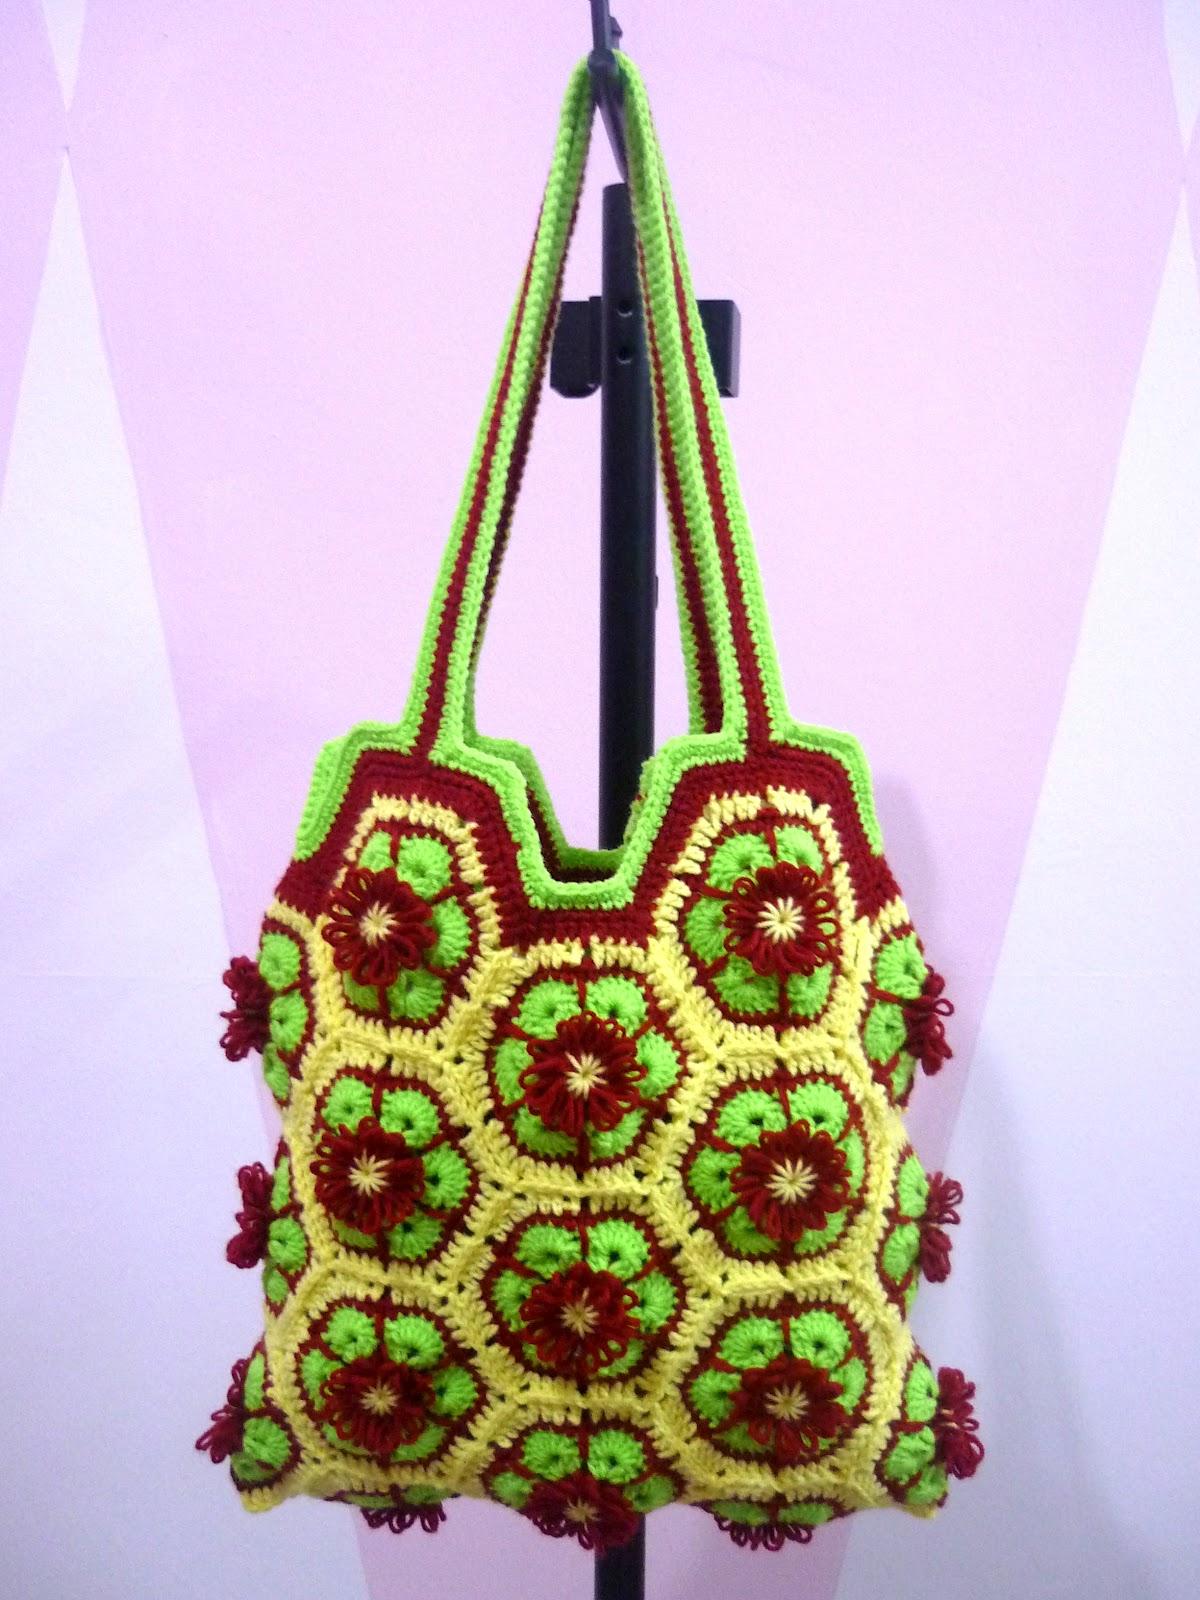 Crochet.is.Fun: Tutorial: African Flower Bag